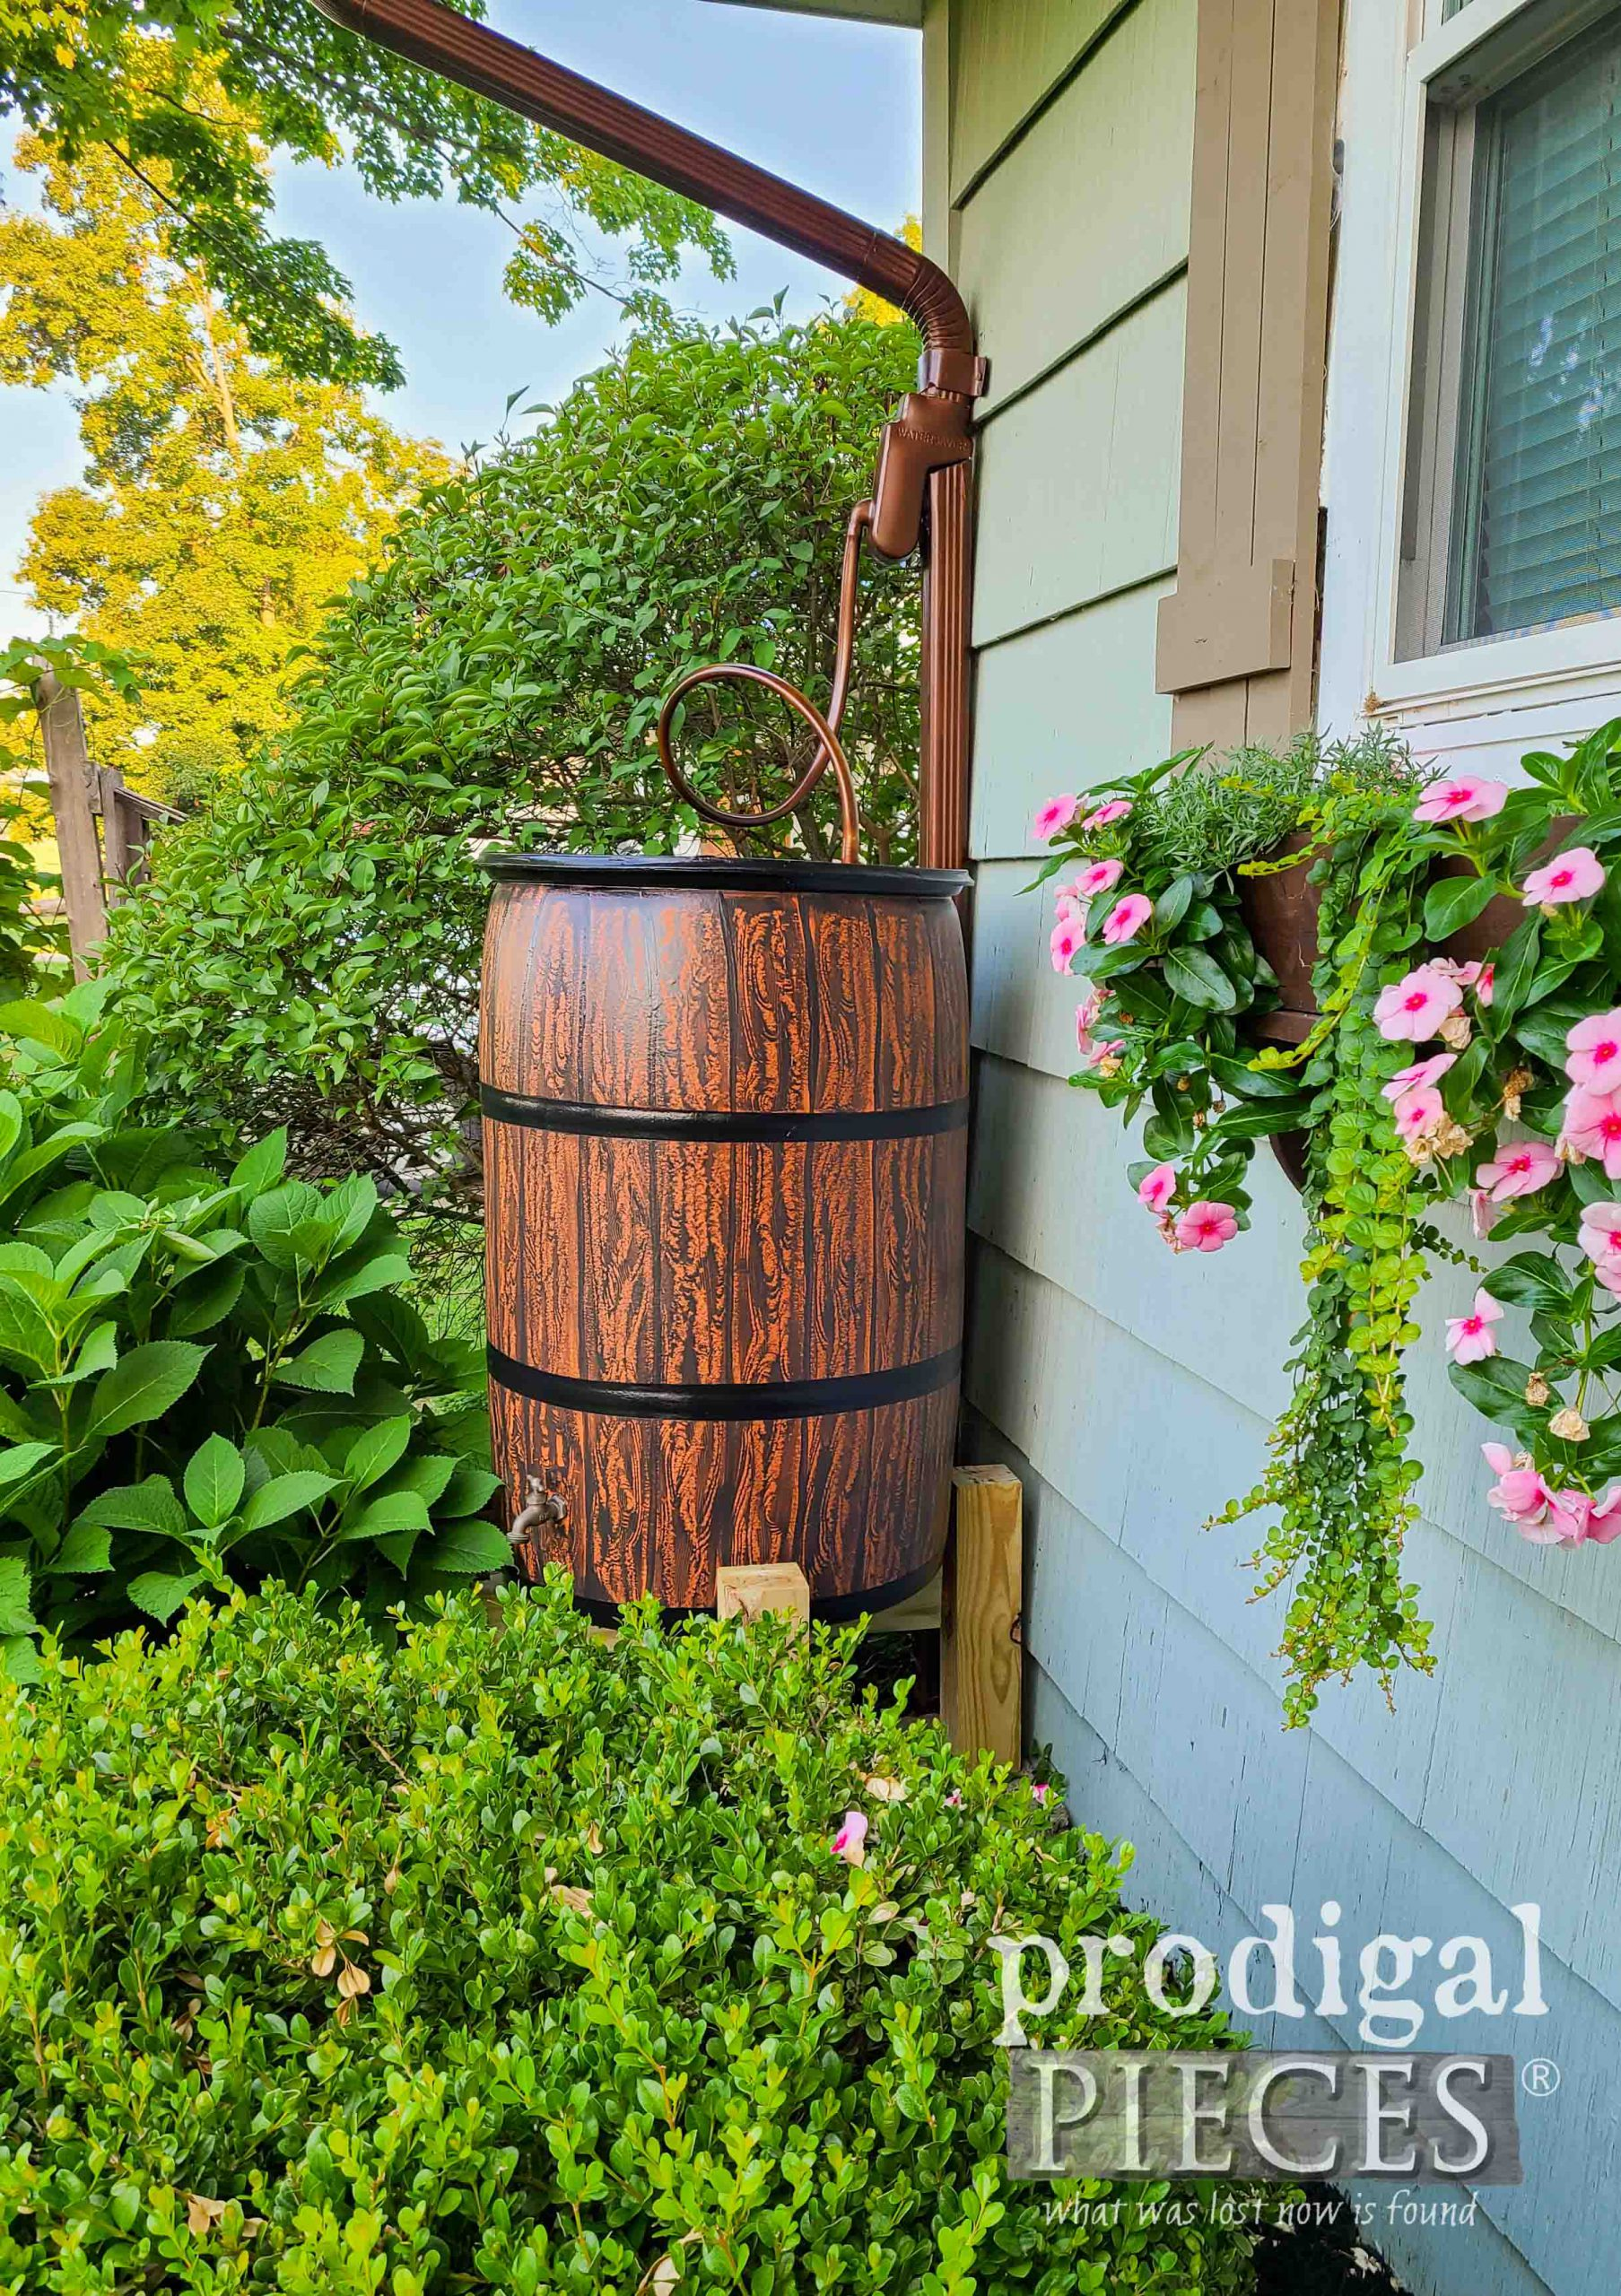 Garden DIY Rain Barrel by Larissa of Prodigal Pieces | prodigalpieces.com #prodigalpieces #diy #garden #selfsufficient #handmade